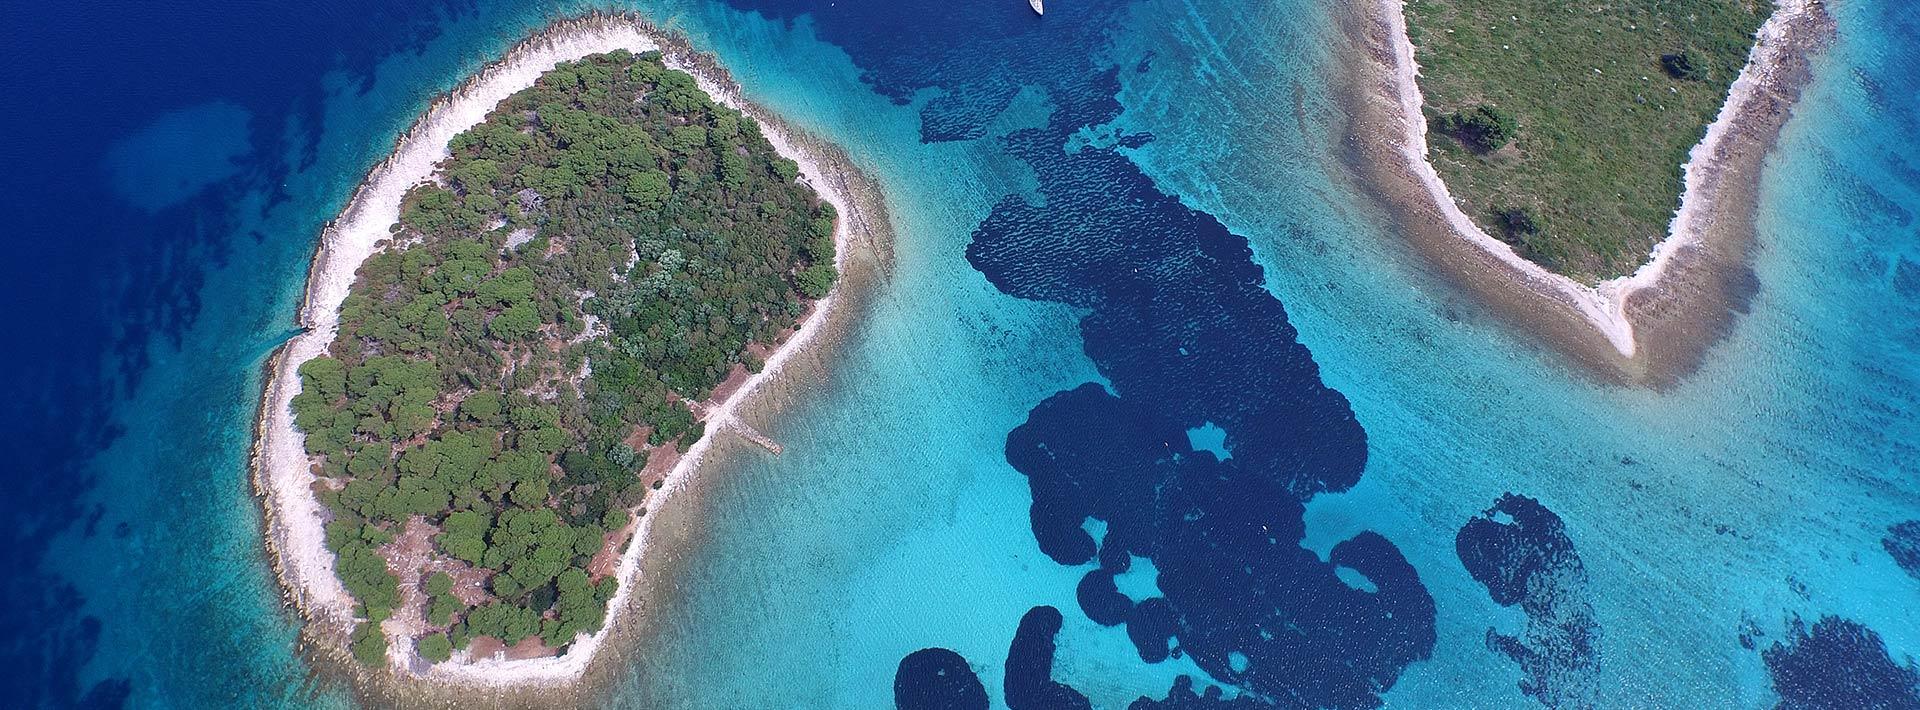 Blue Lagoon Croatia, view on Krknjasi islands from above